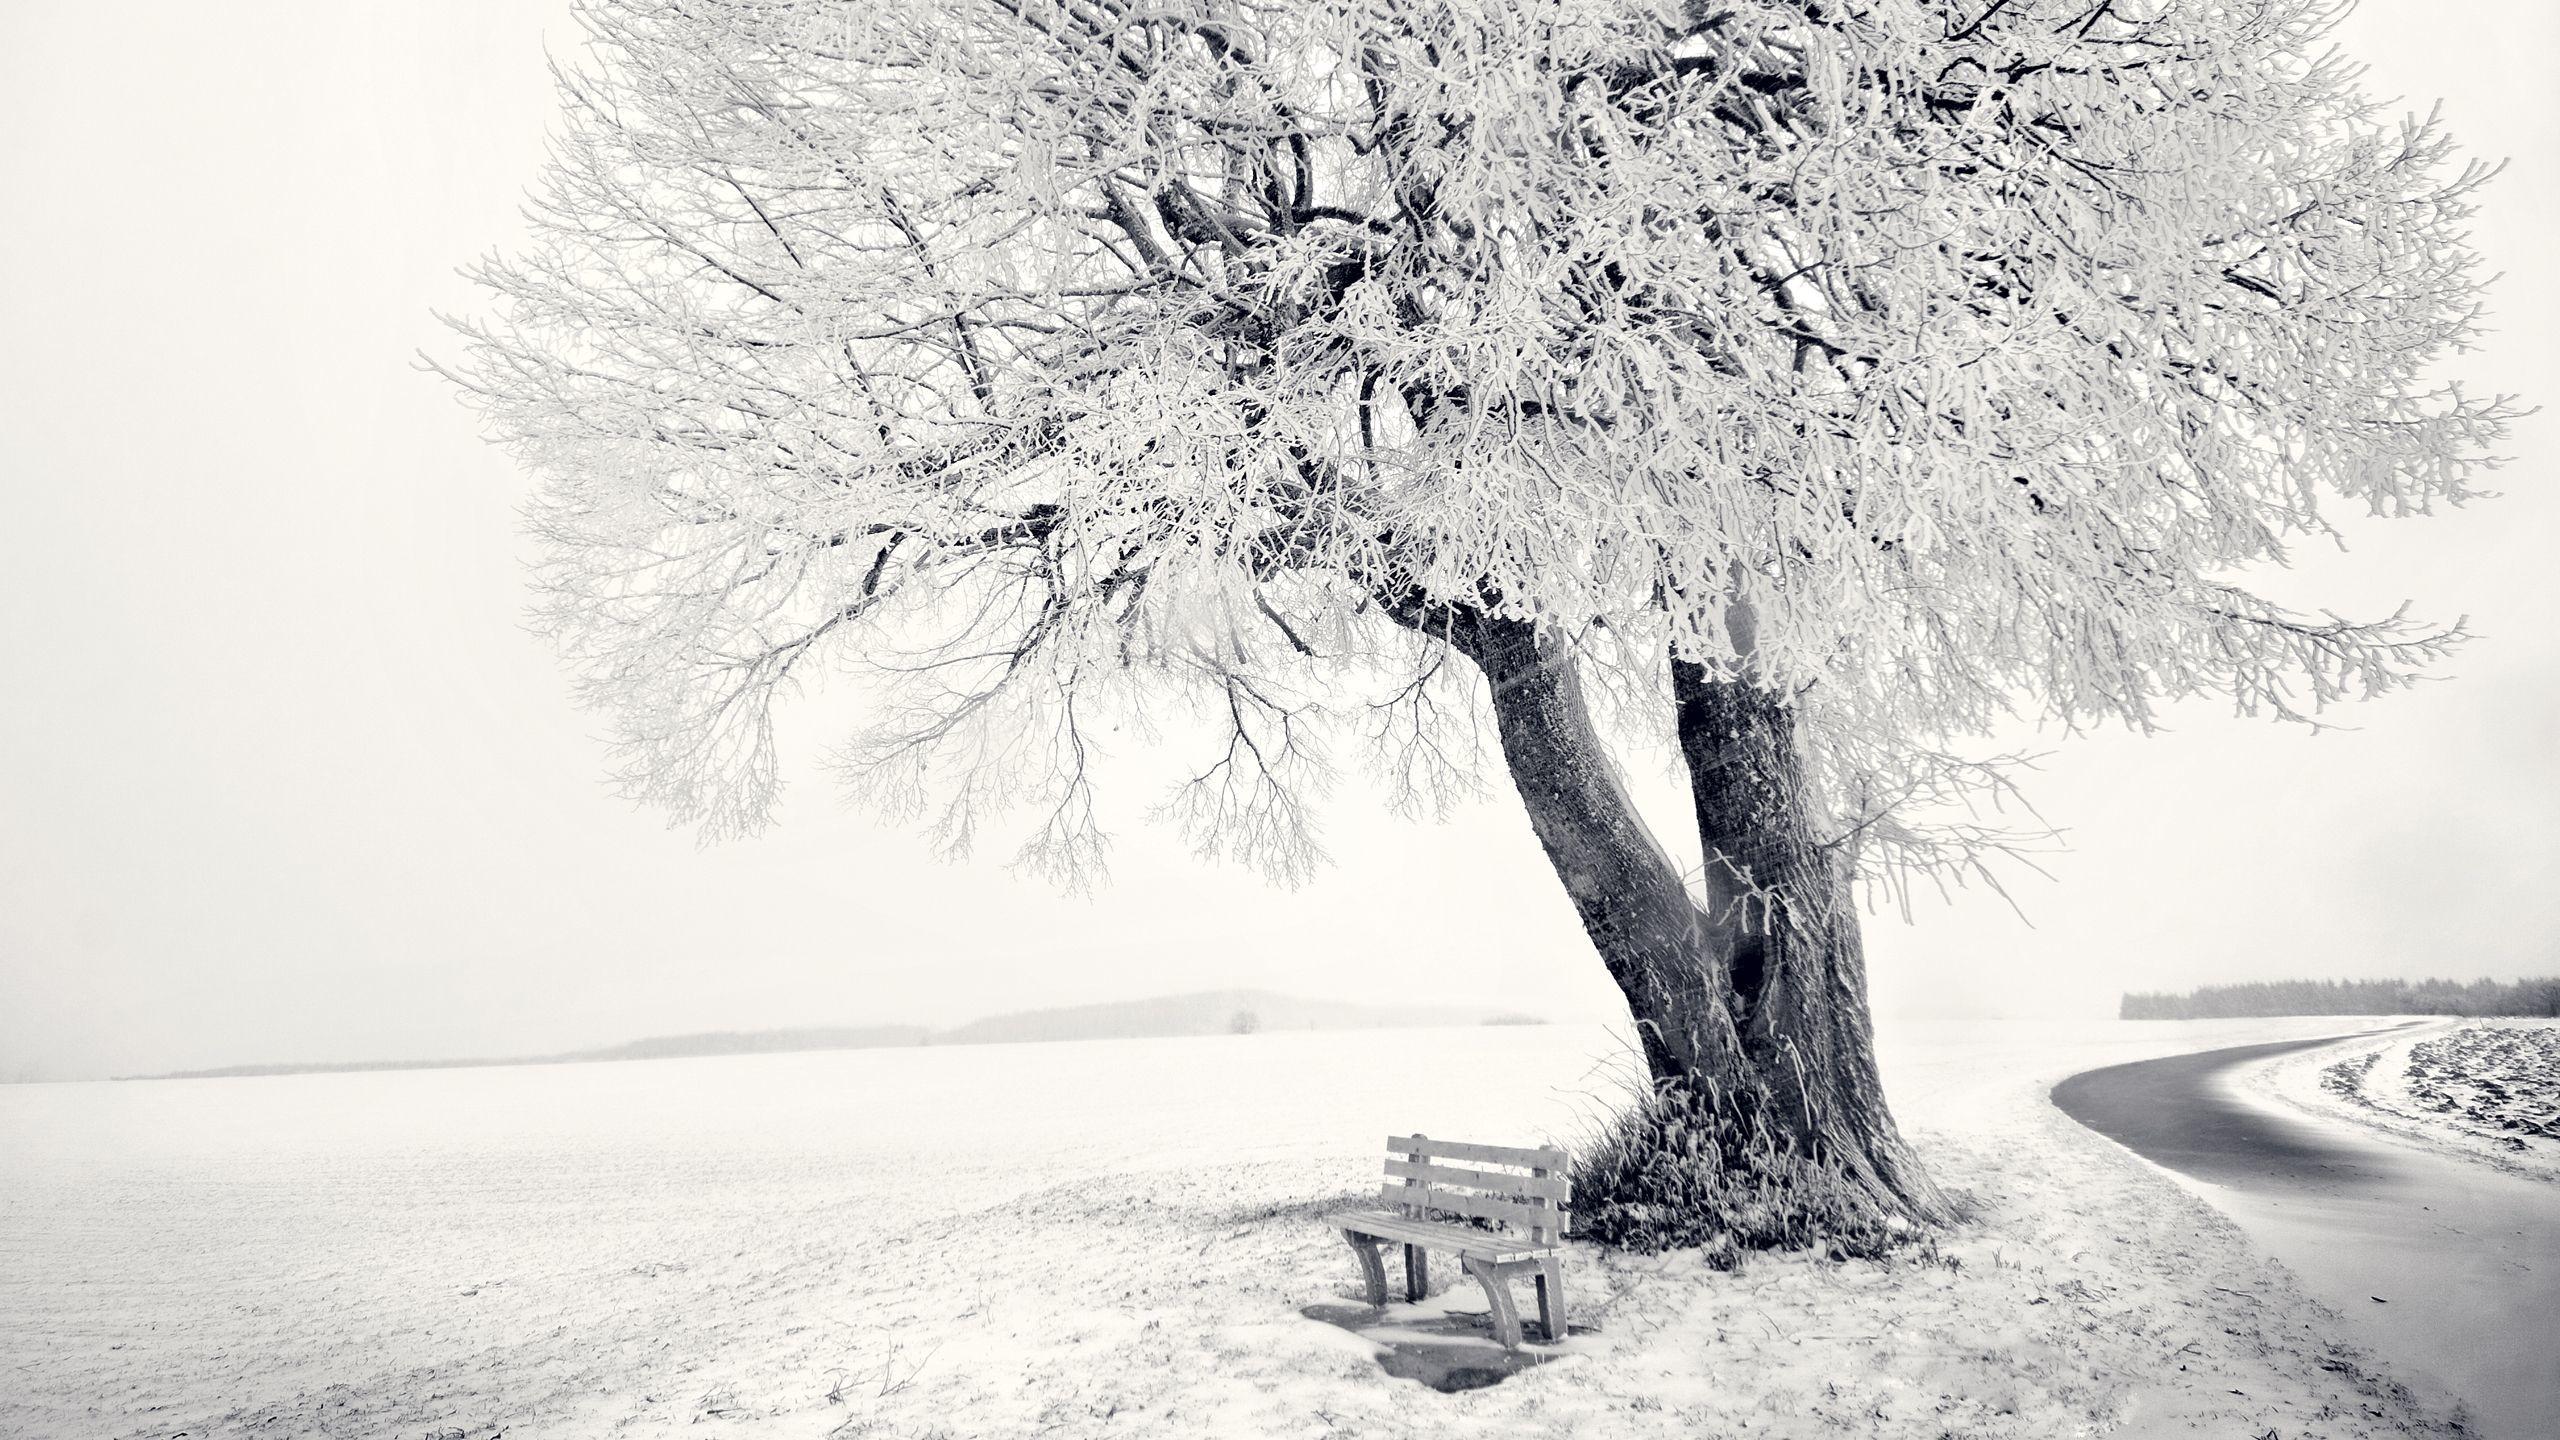 Res: 2560x1440, Snow Winter Scene Wallpaper |  | ID:22858